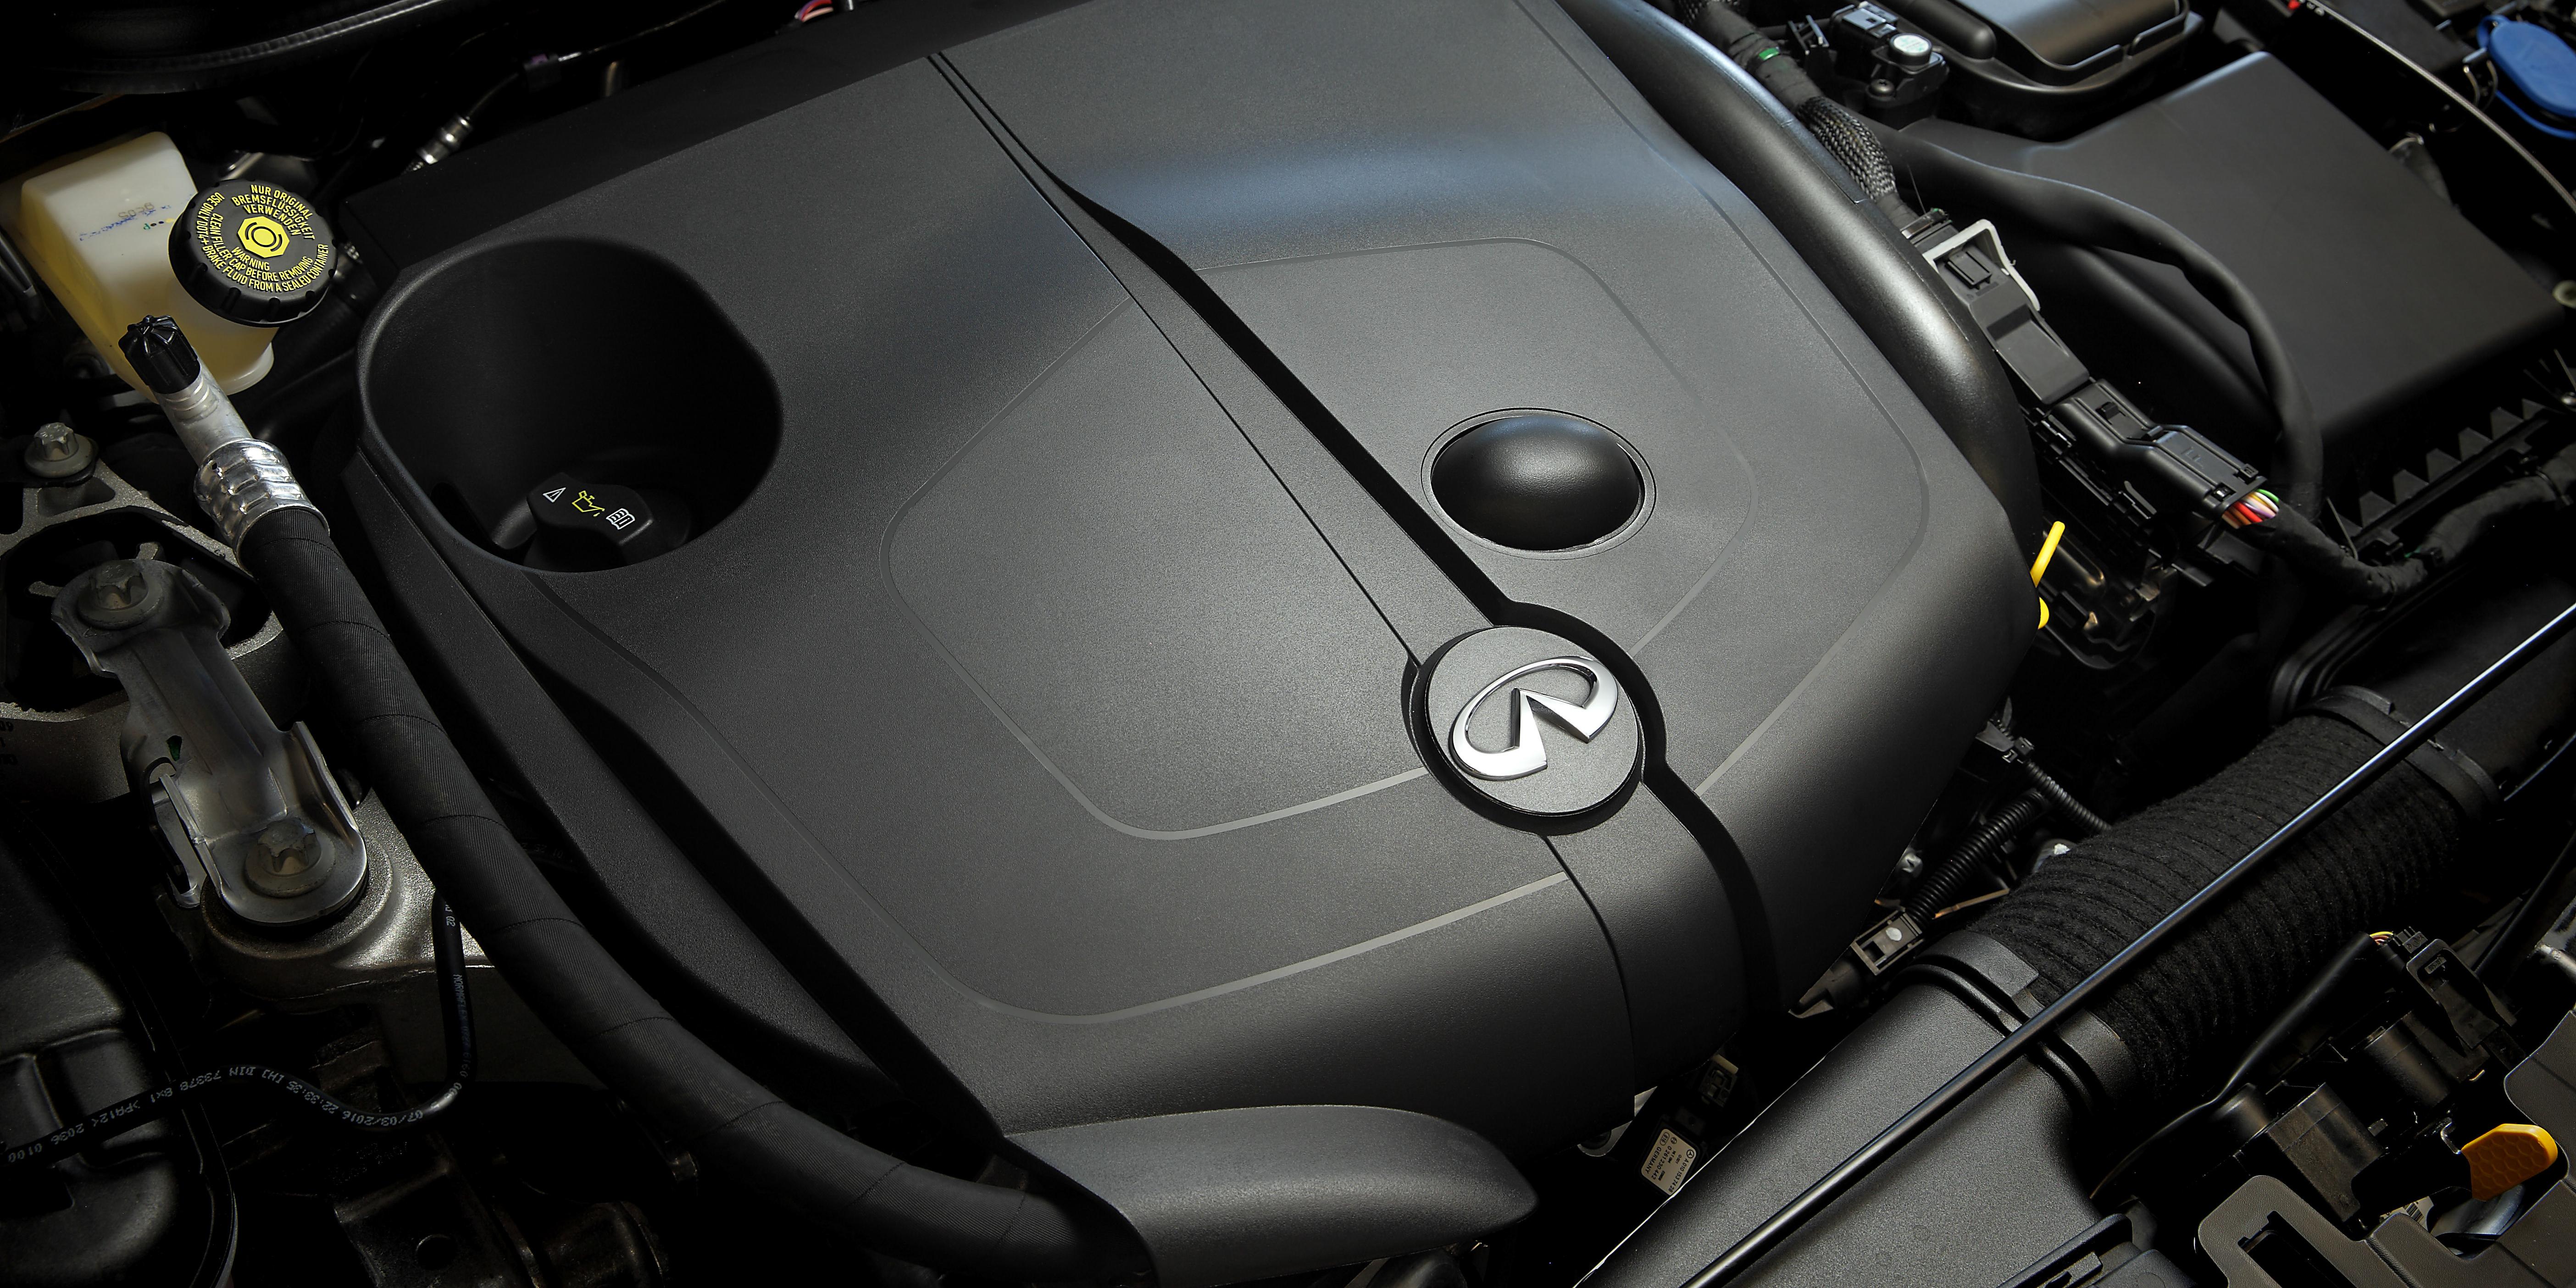 2018 Infiniti Q30 engine